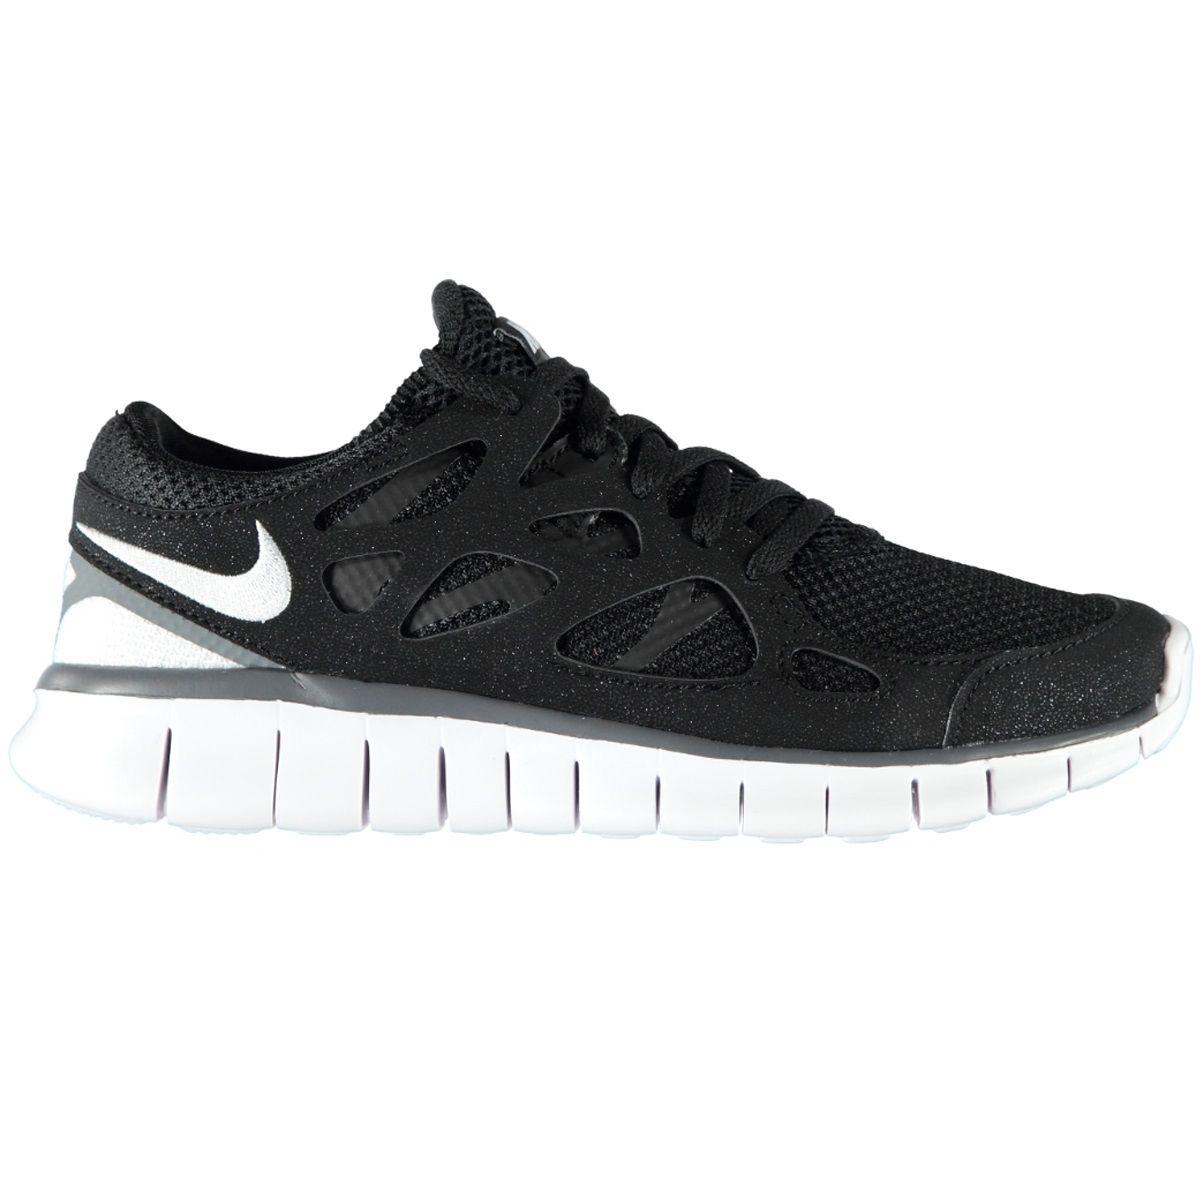 NIKE Free run 2, black   Nike free, Nike free runs, Schoenen